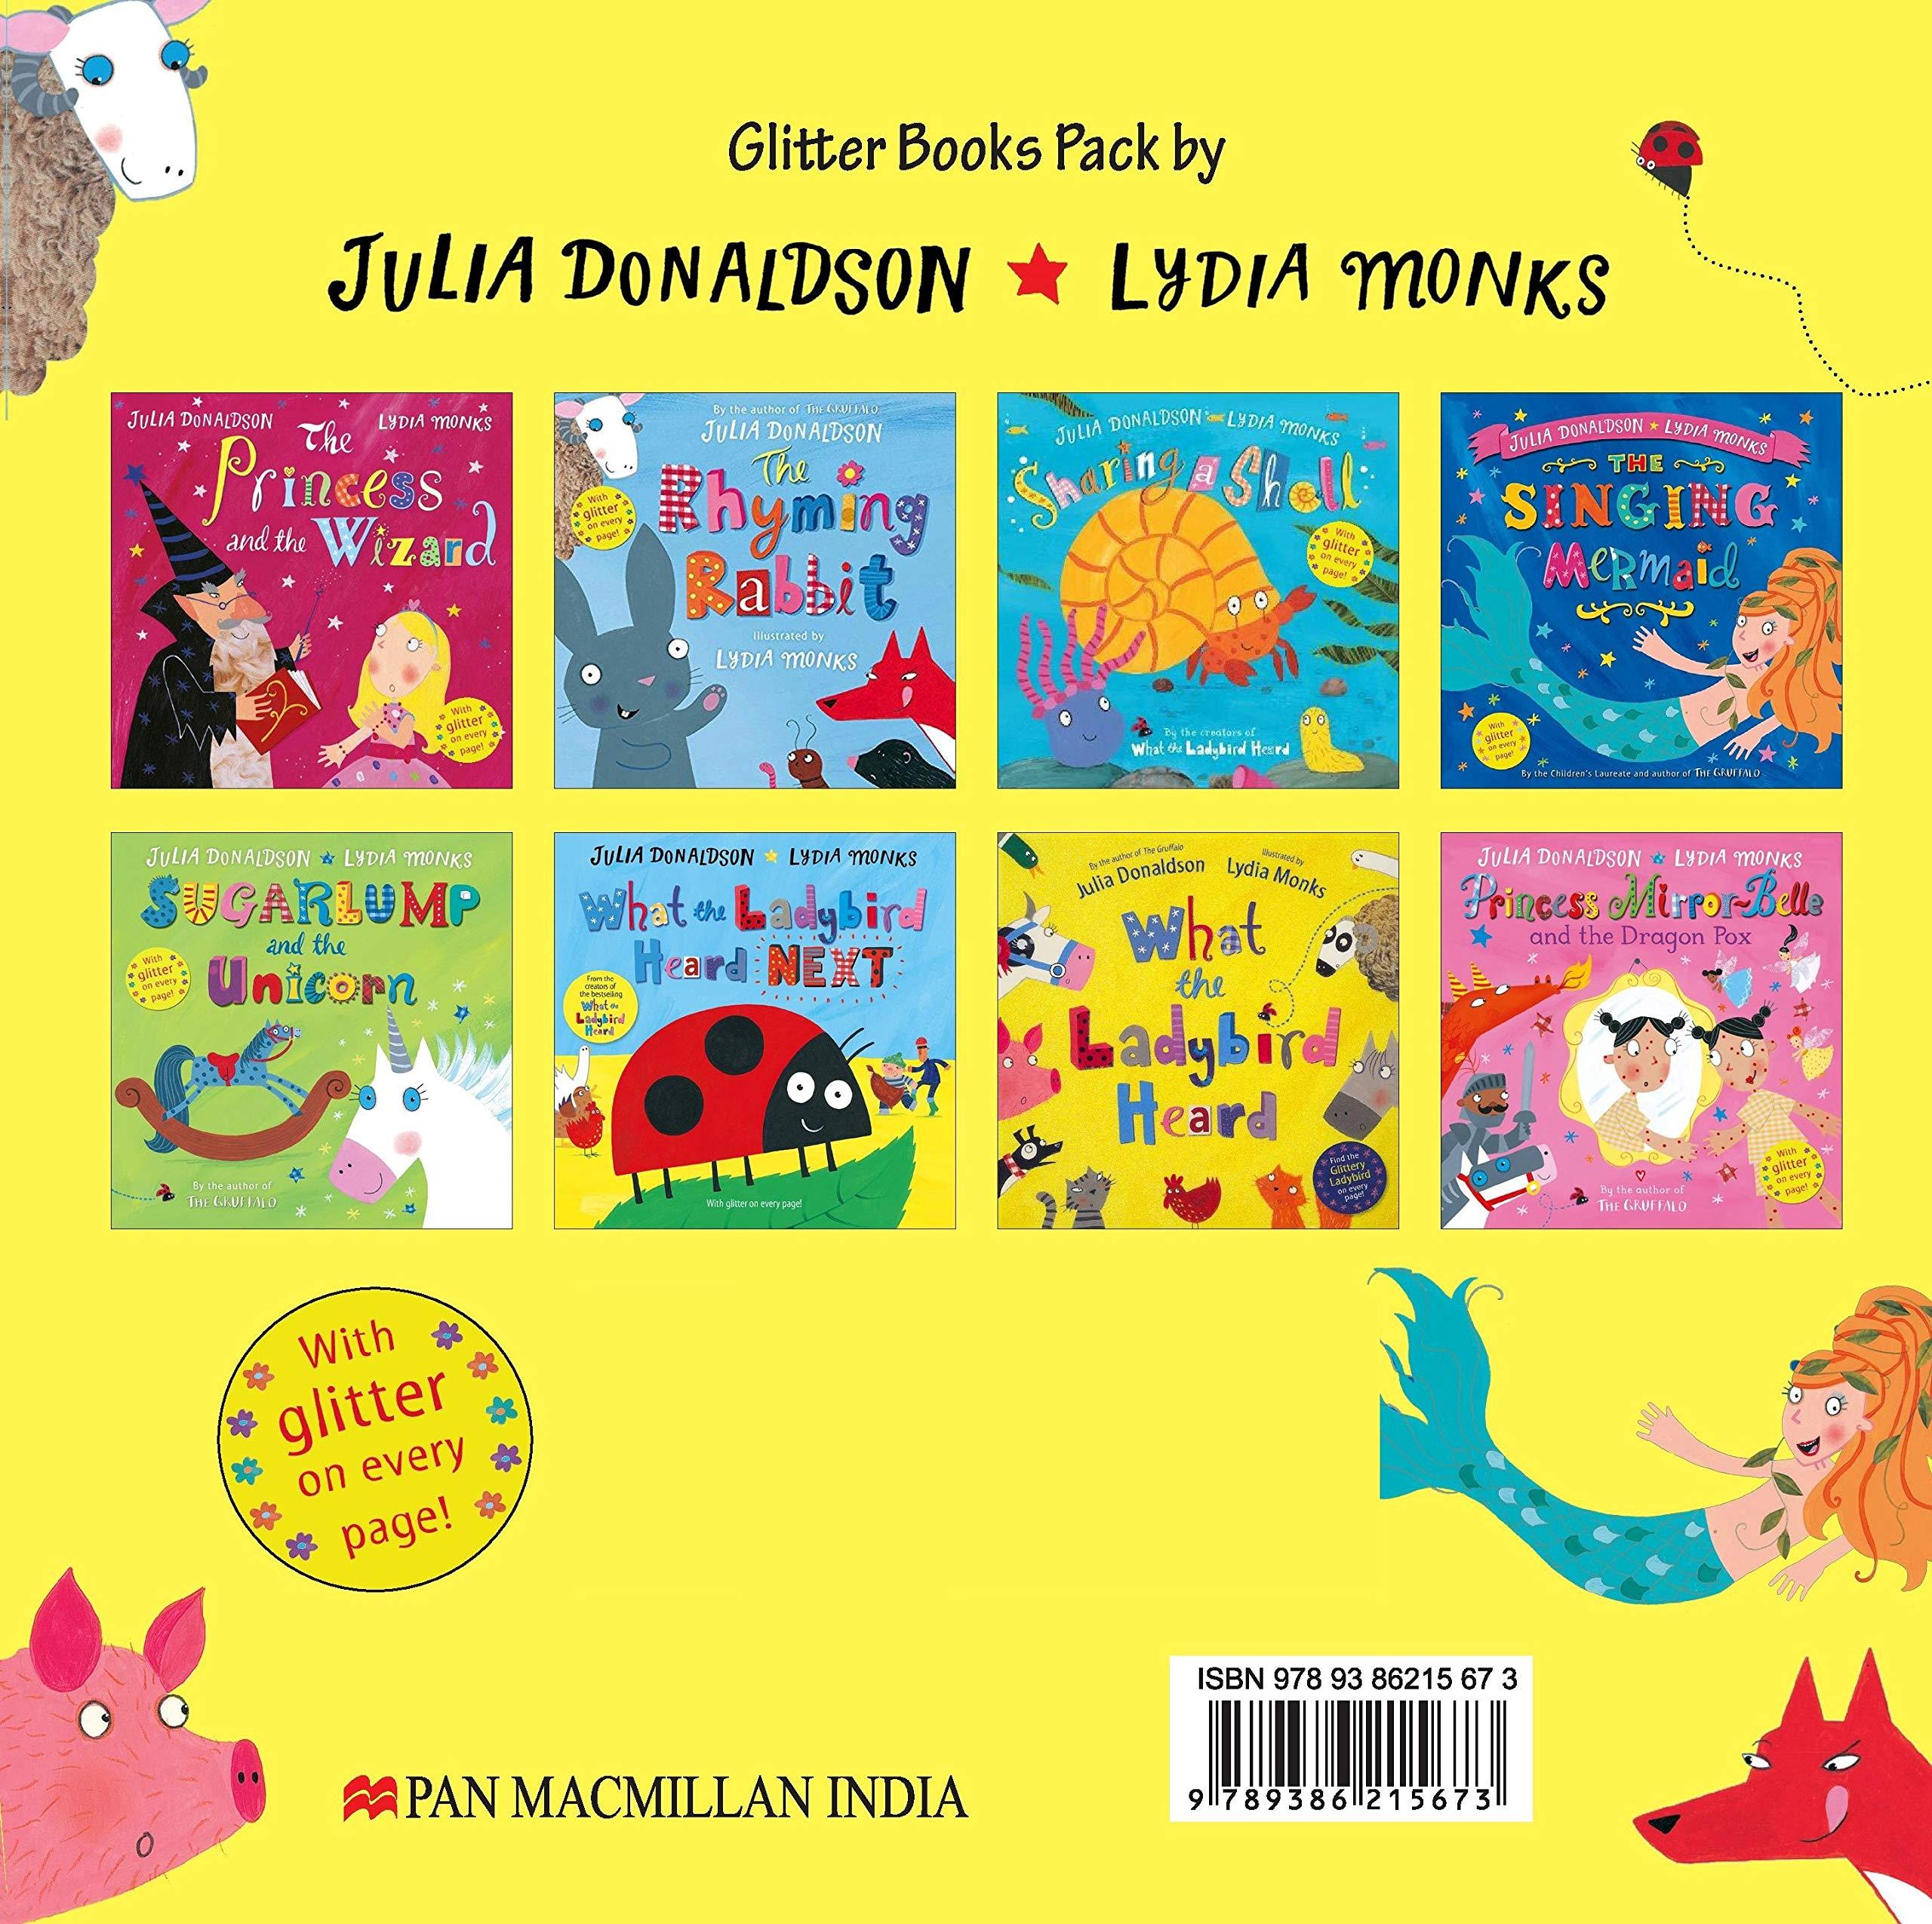 Julia Donaldson and Lydia Monks x 8 Glitter Books Pack: Amazon.es ...